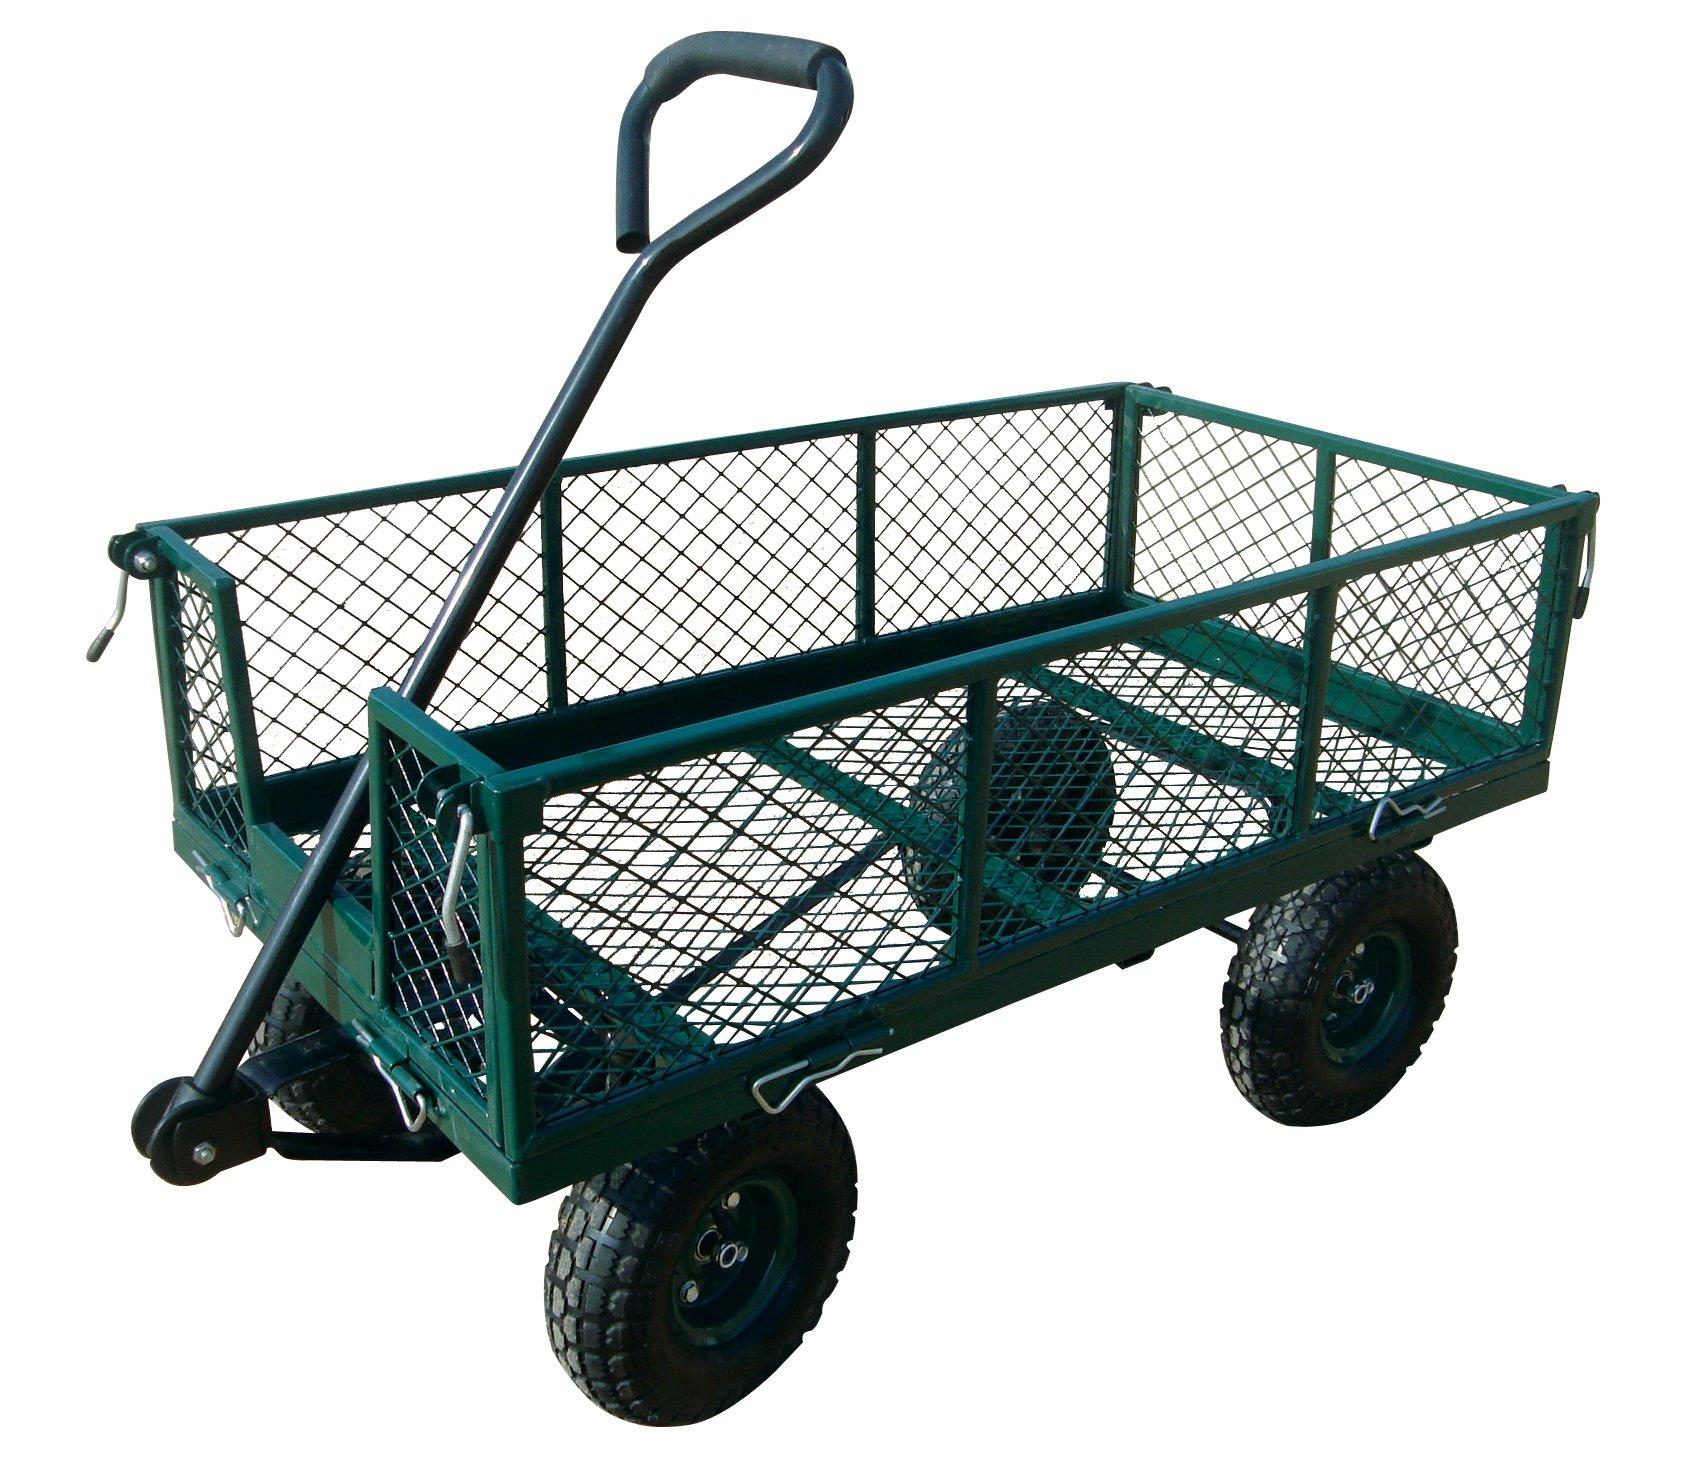 Sandusky Lee CW3418 Muscle Carts Steel Utility Garden Wagon, 400 lb. Load Capacity, 21-3/4'' Height x 34'' Length x 18'' Width by Sandusky (Image #2)